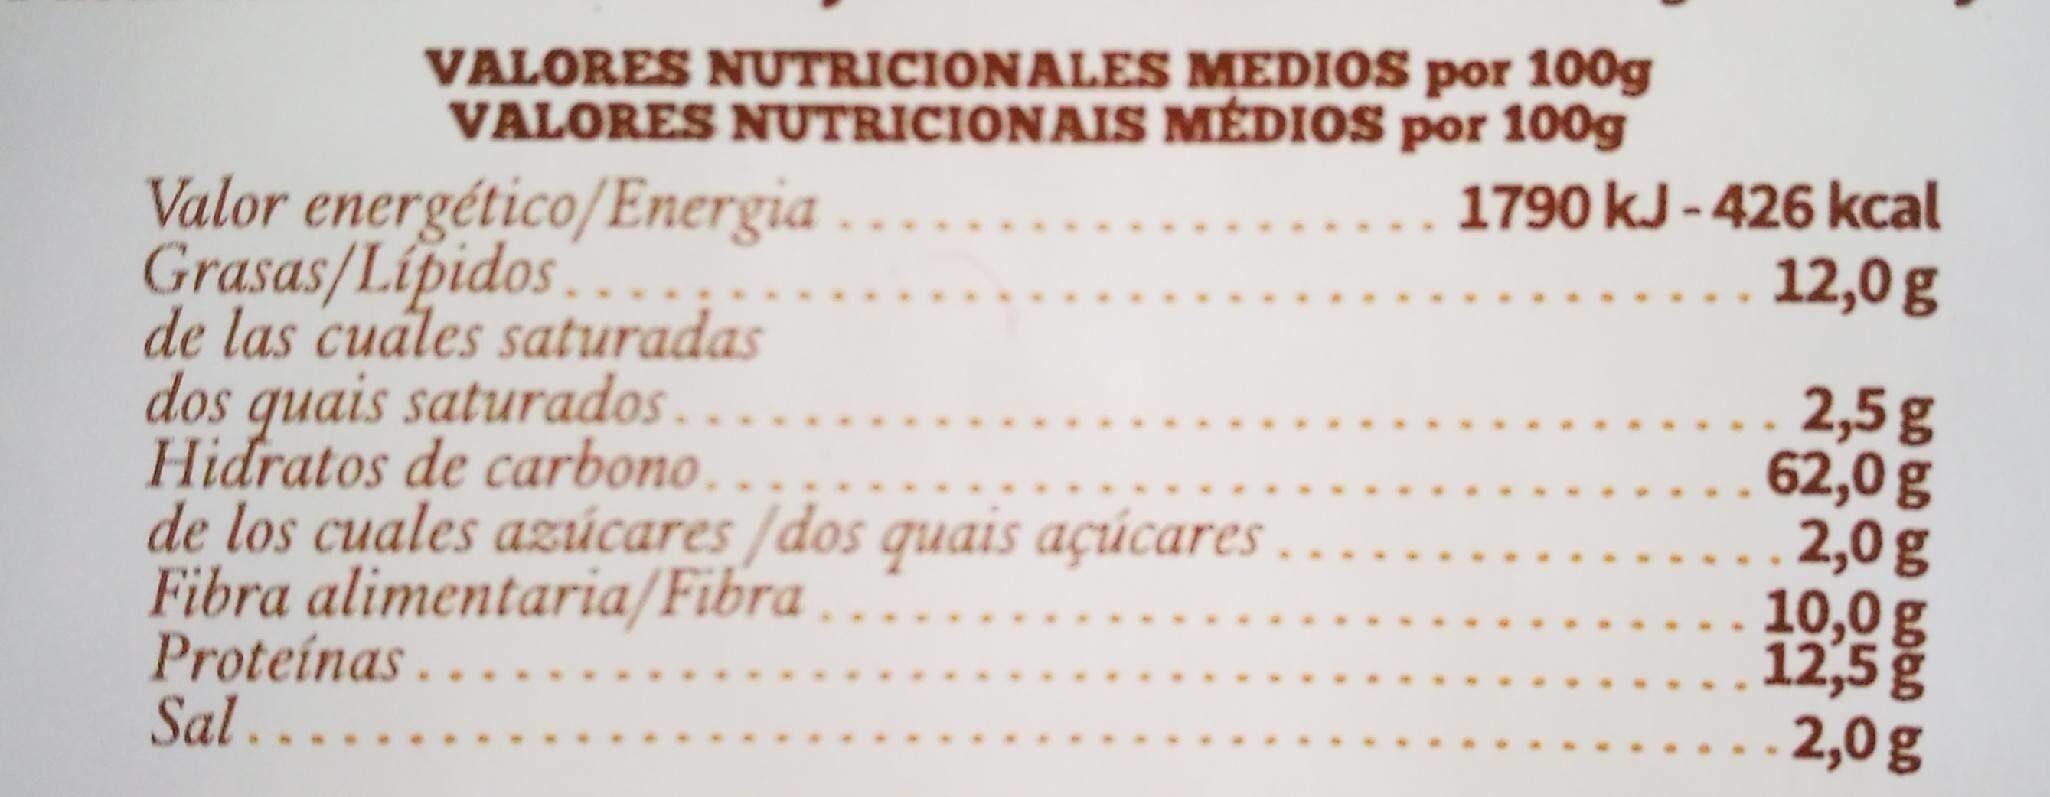 Palitos integrales sésamo - Valori nutrizionali - es